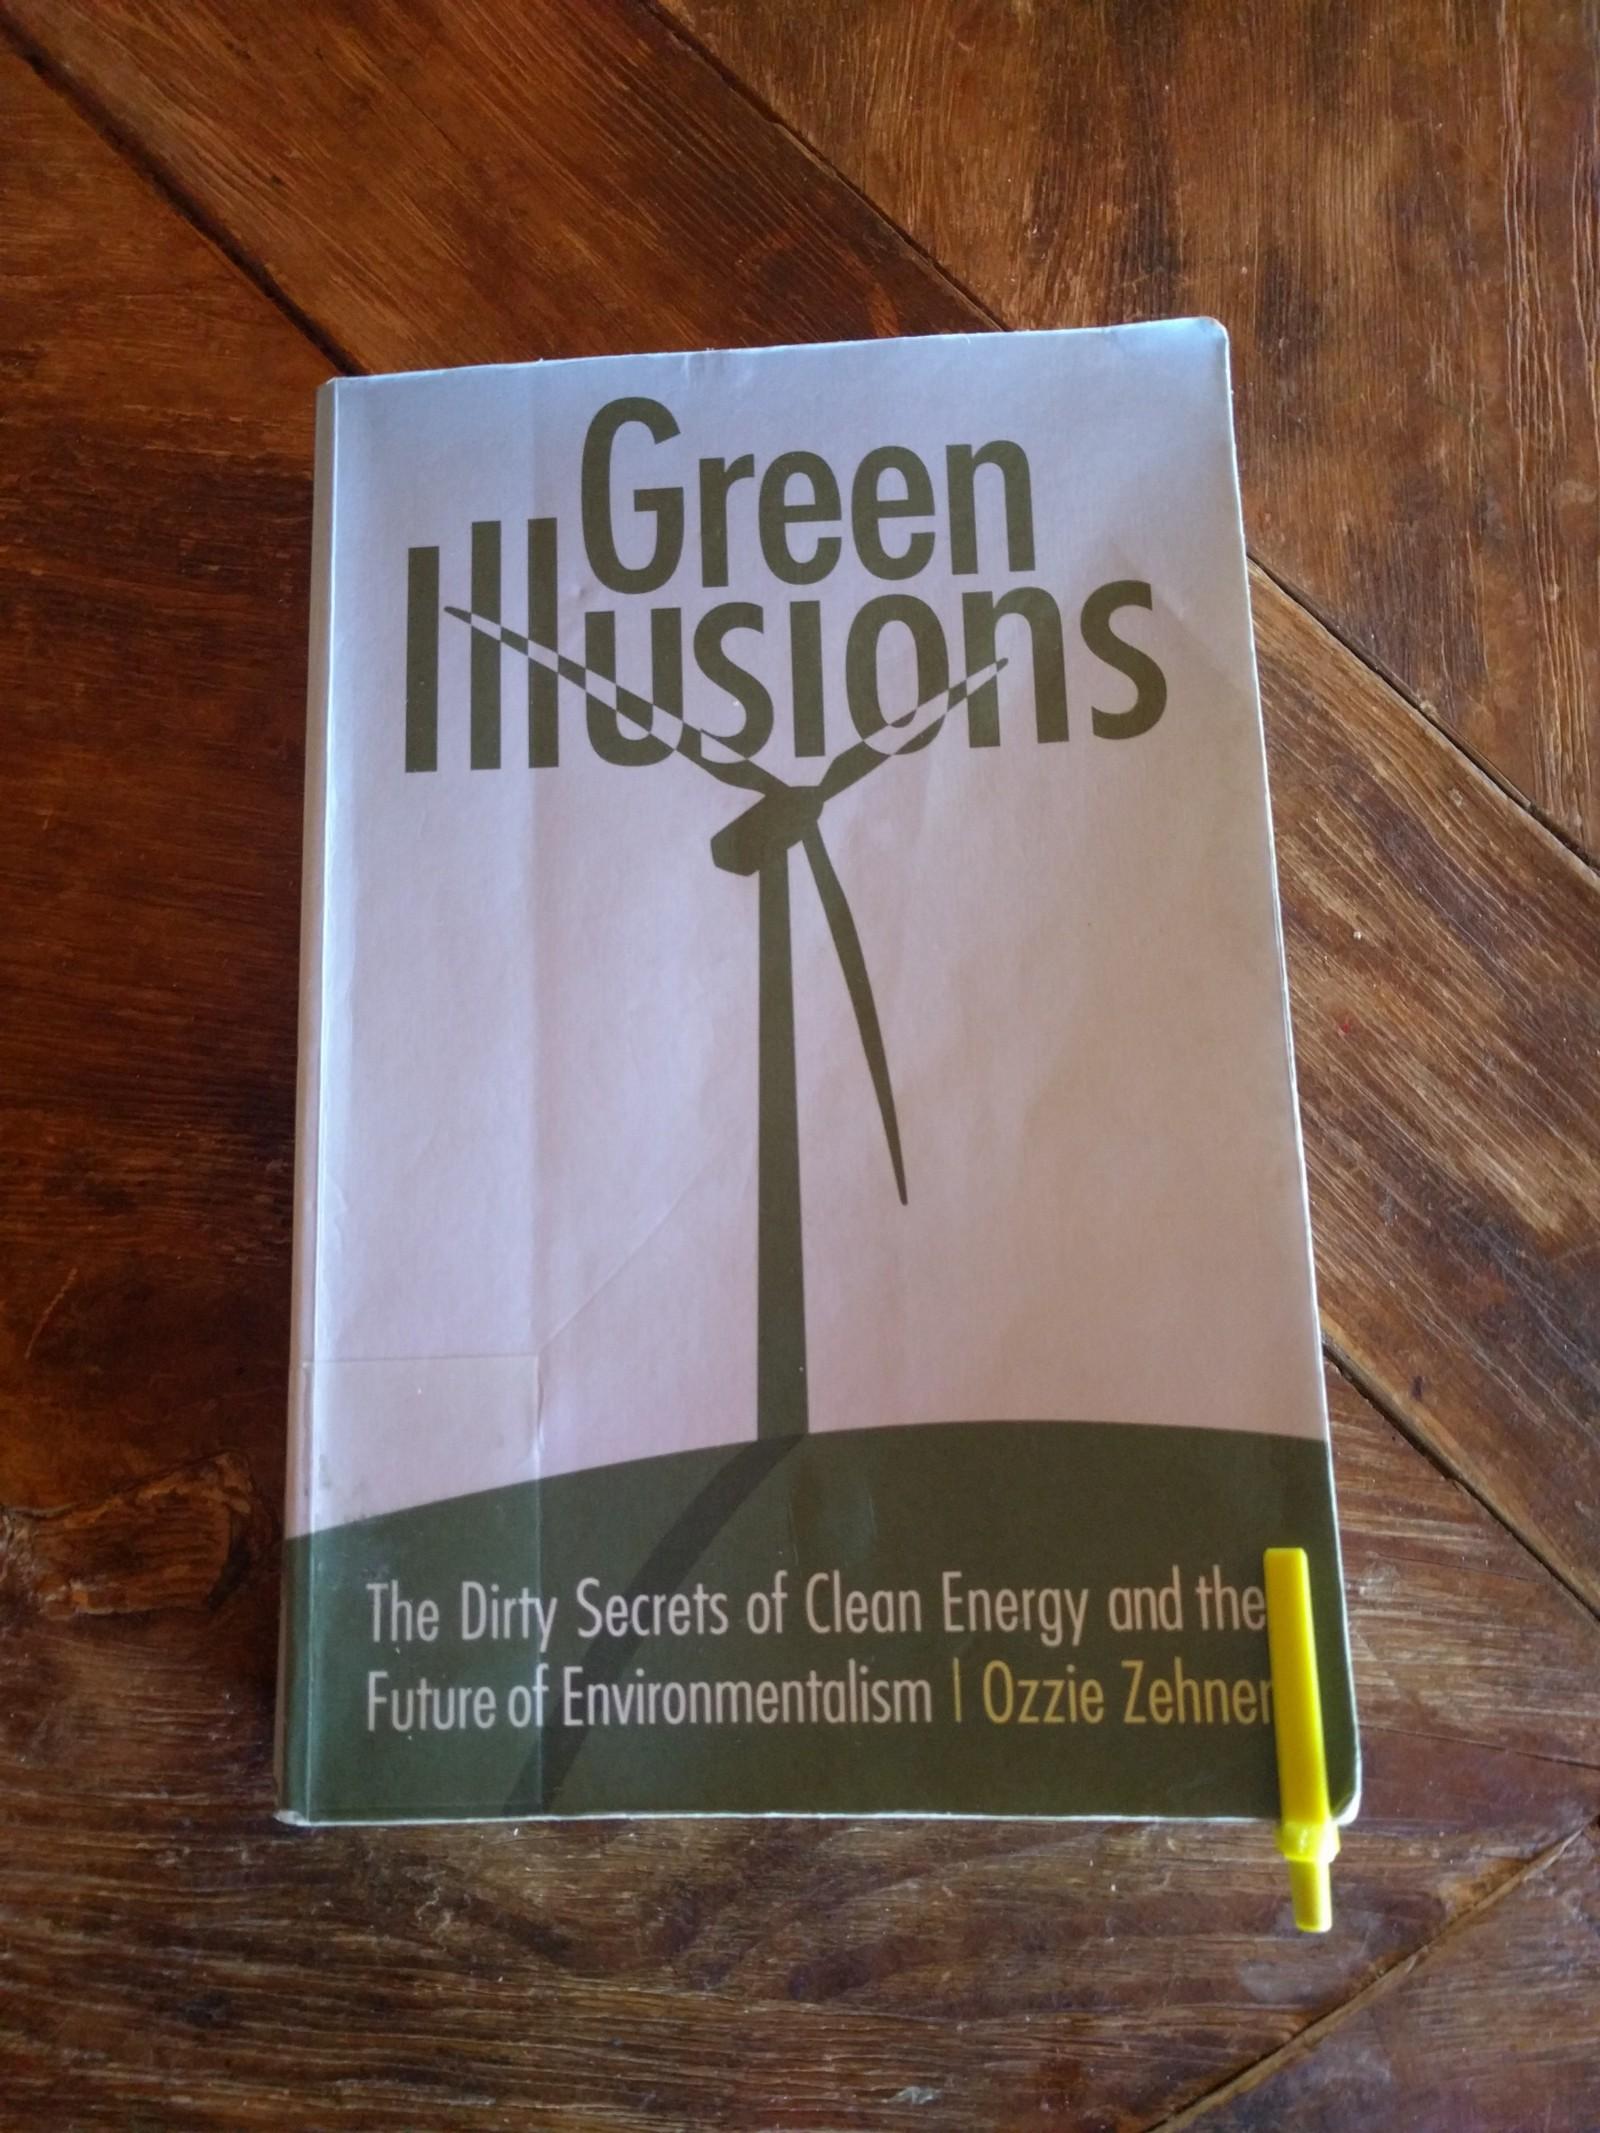 Green Illusions Summary